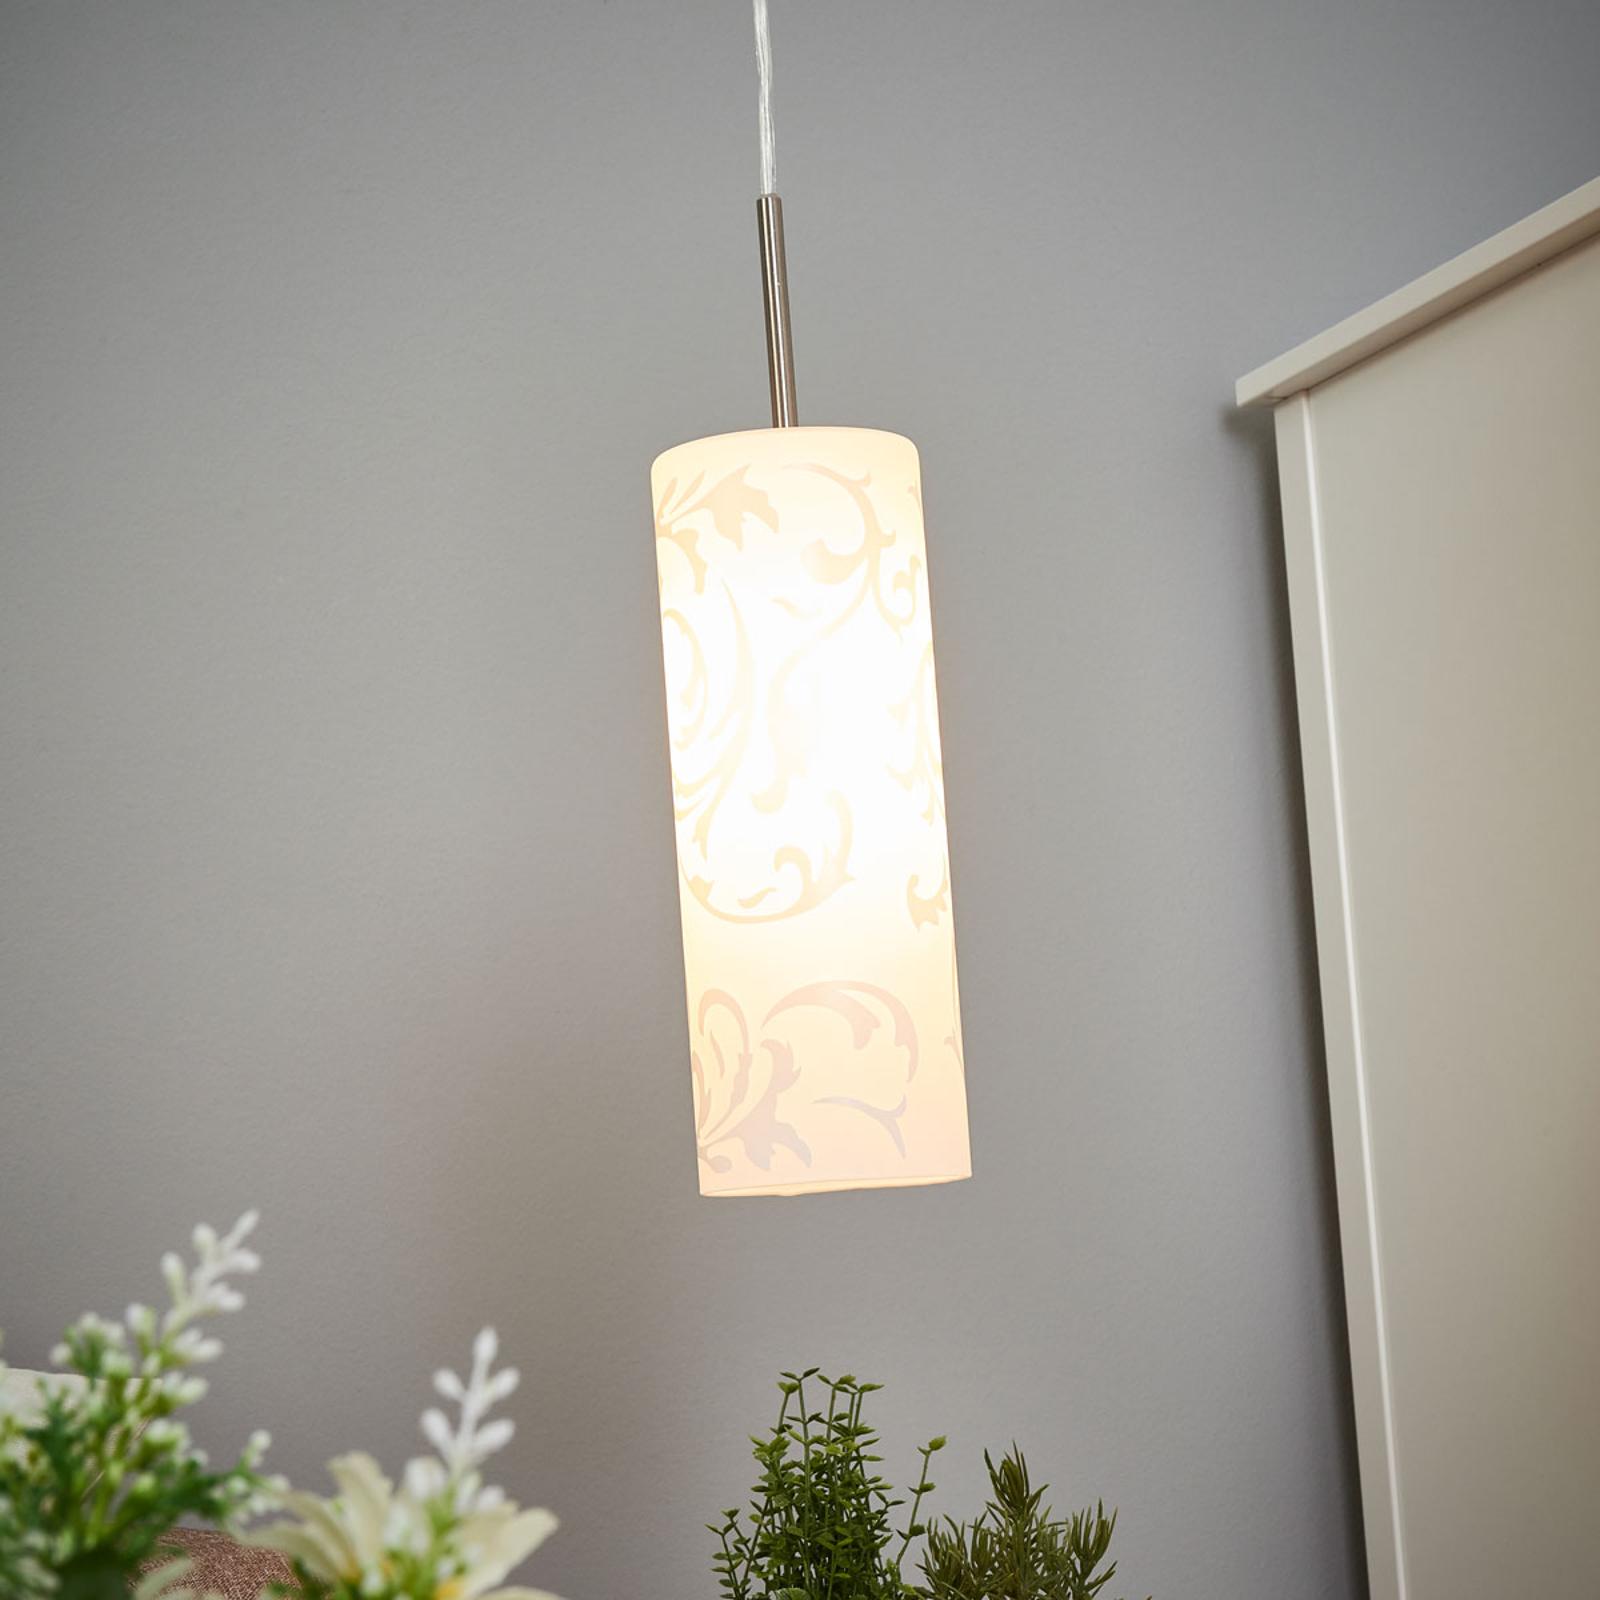 Amanda - artistic pendant light, 1-bulb_3001061_1